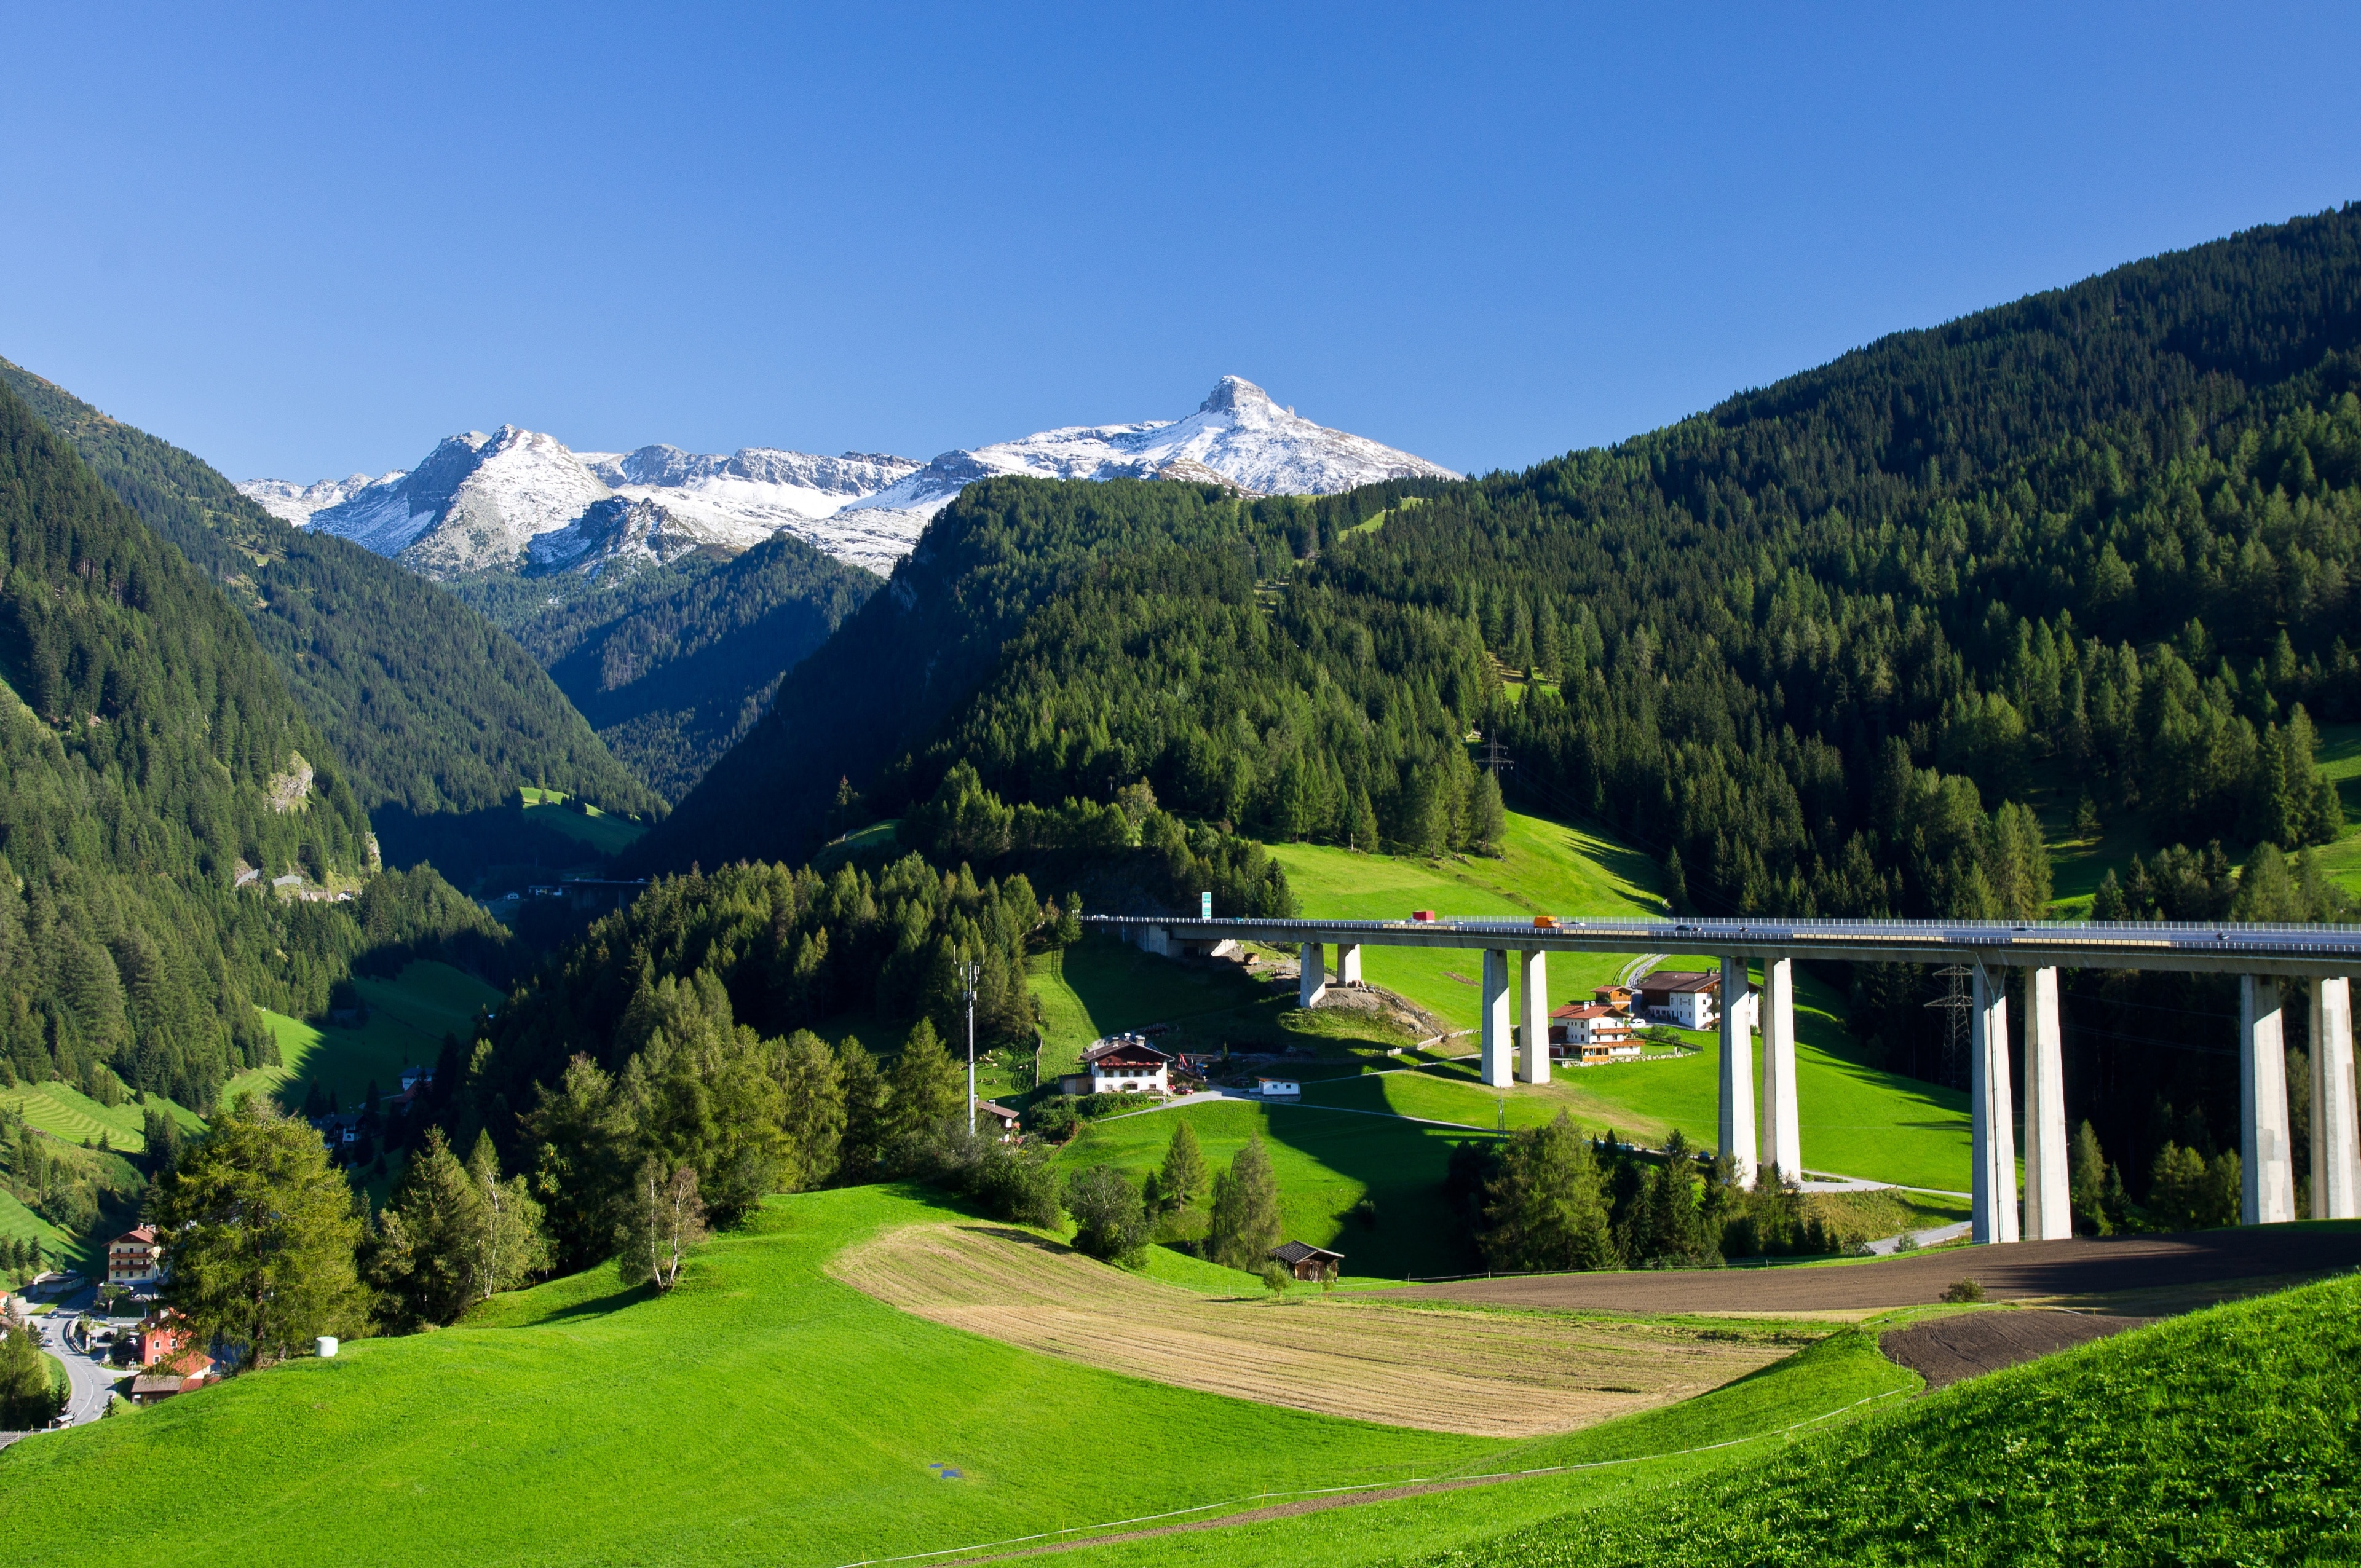 Brennero, Trentino-Alto Adige, Italy